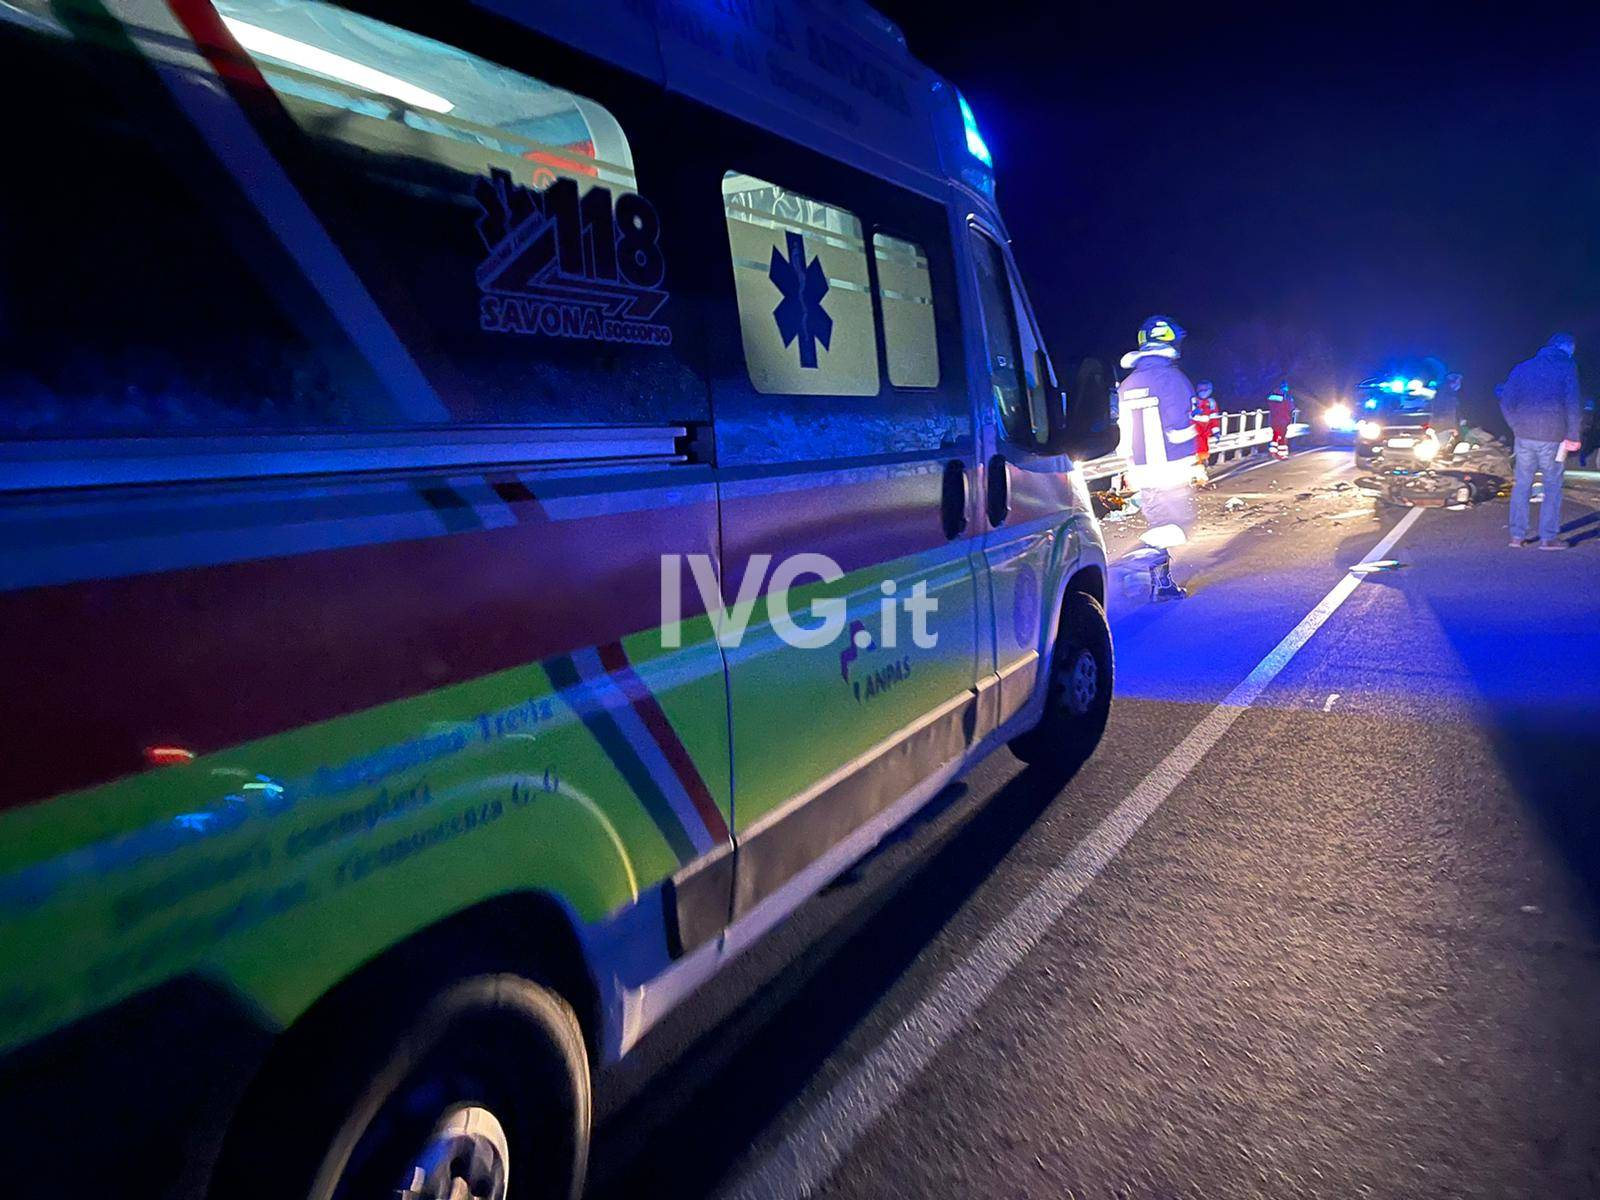 Incidente mortale ad Andora